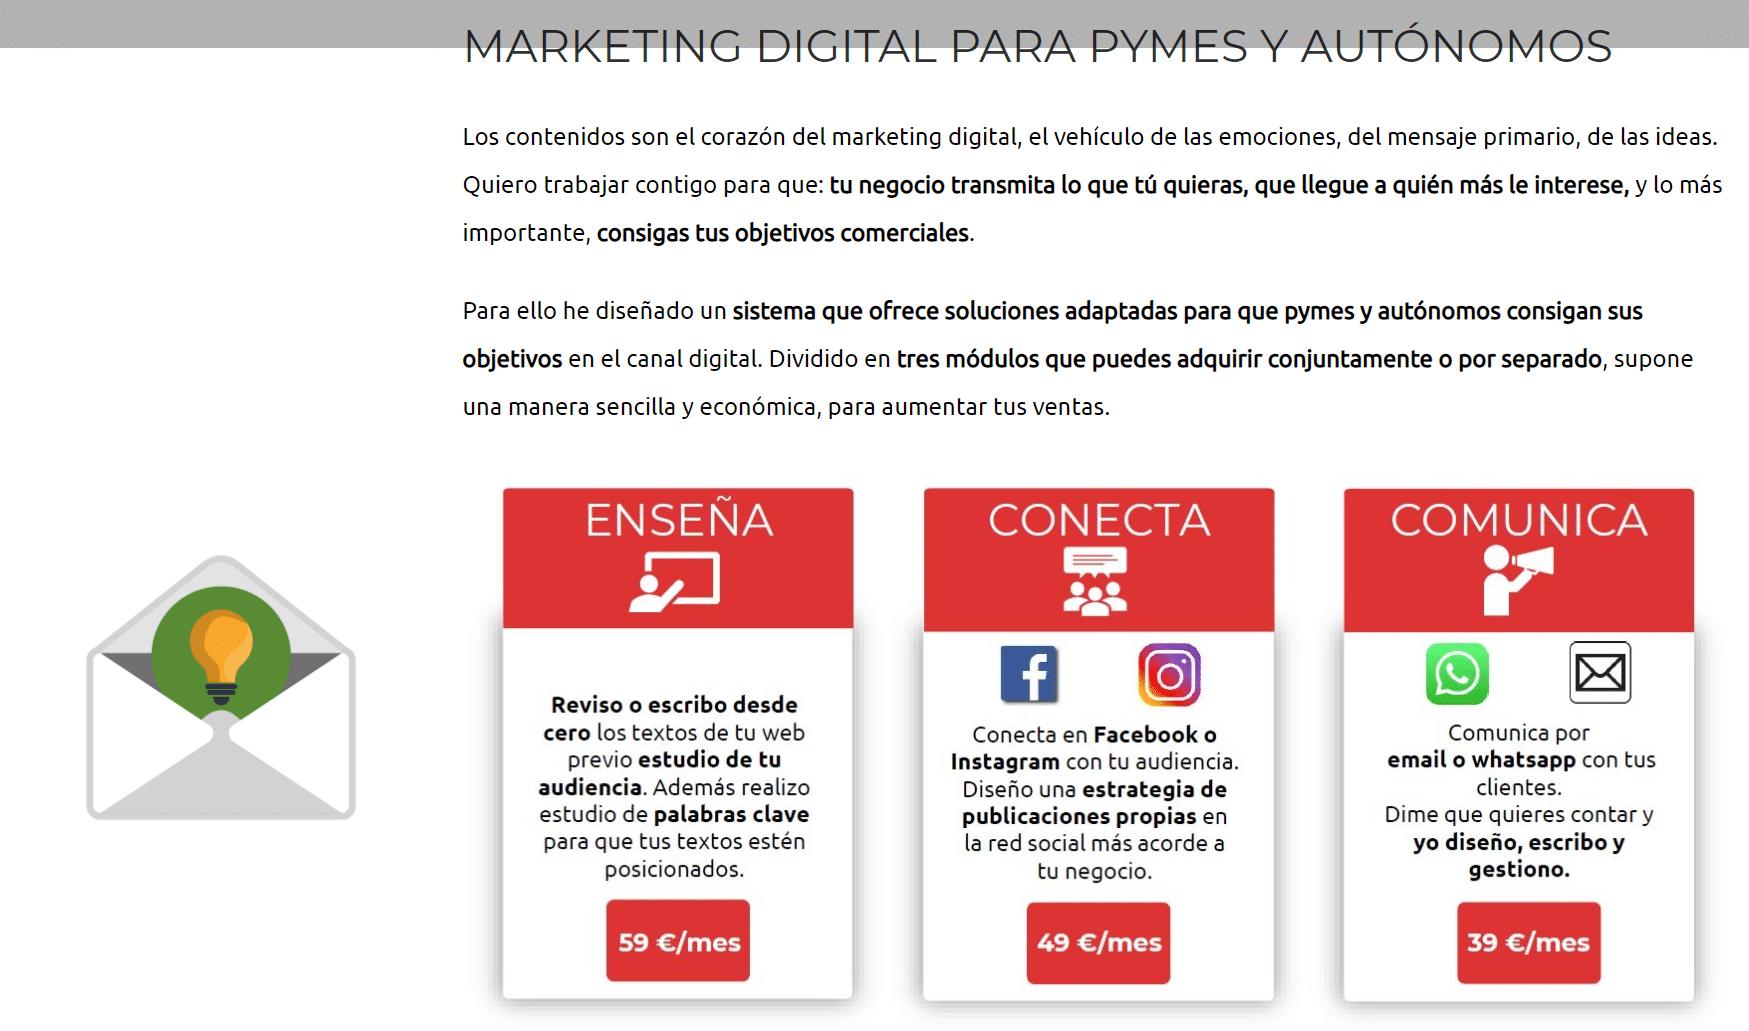 SEO-Copywriting-Ejemplo-marketing-digital-pymes-autonomos-paulapmartin